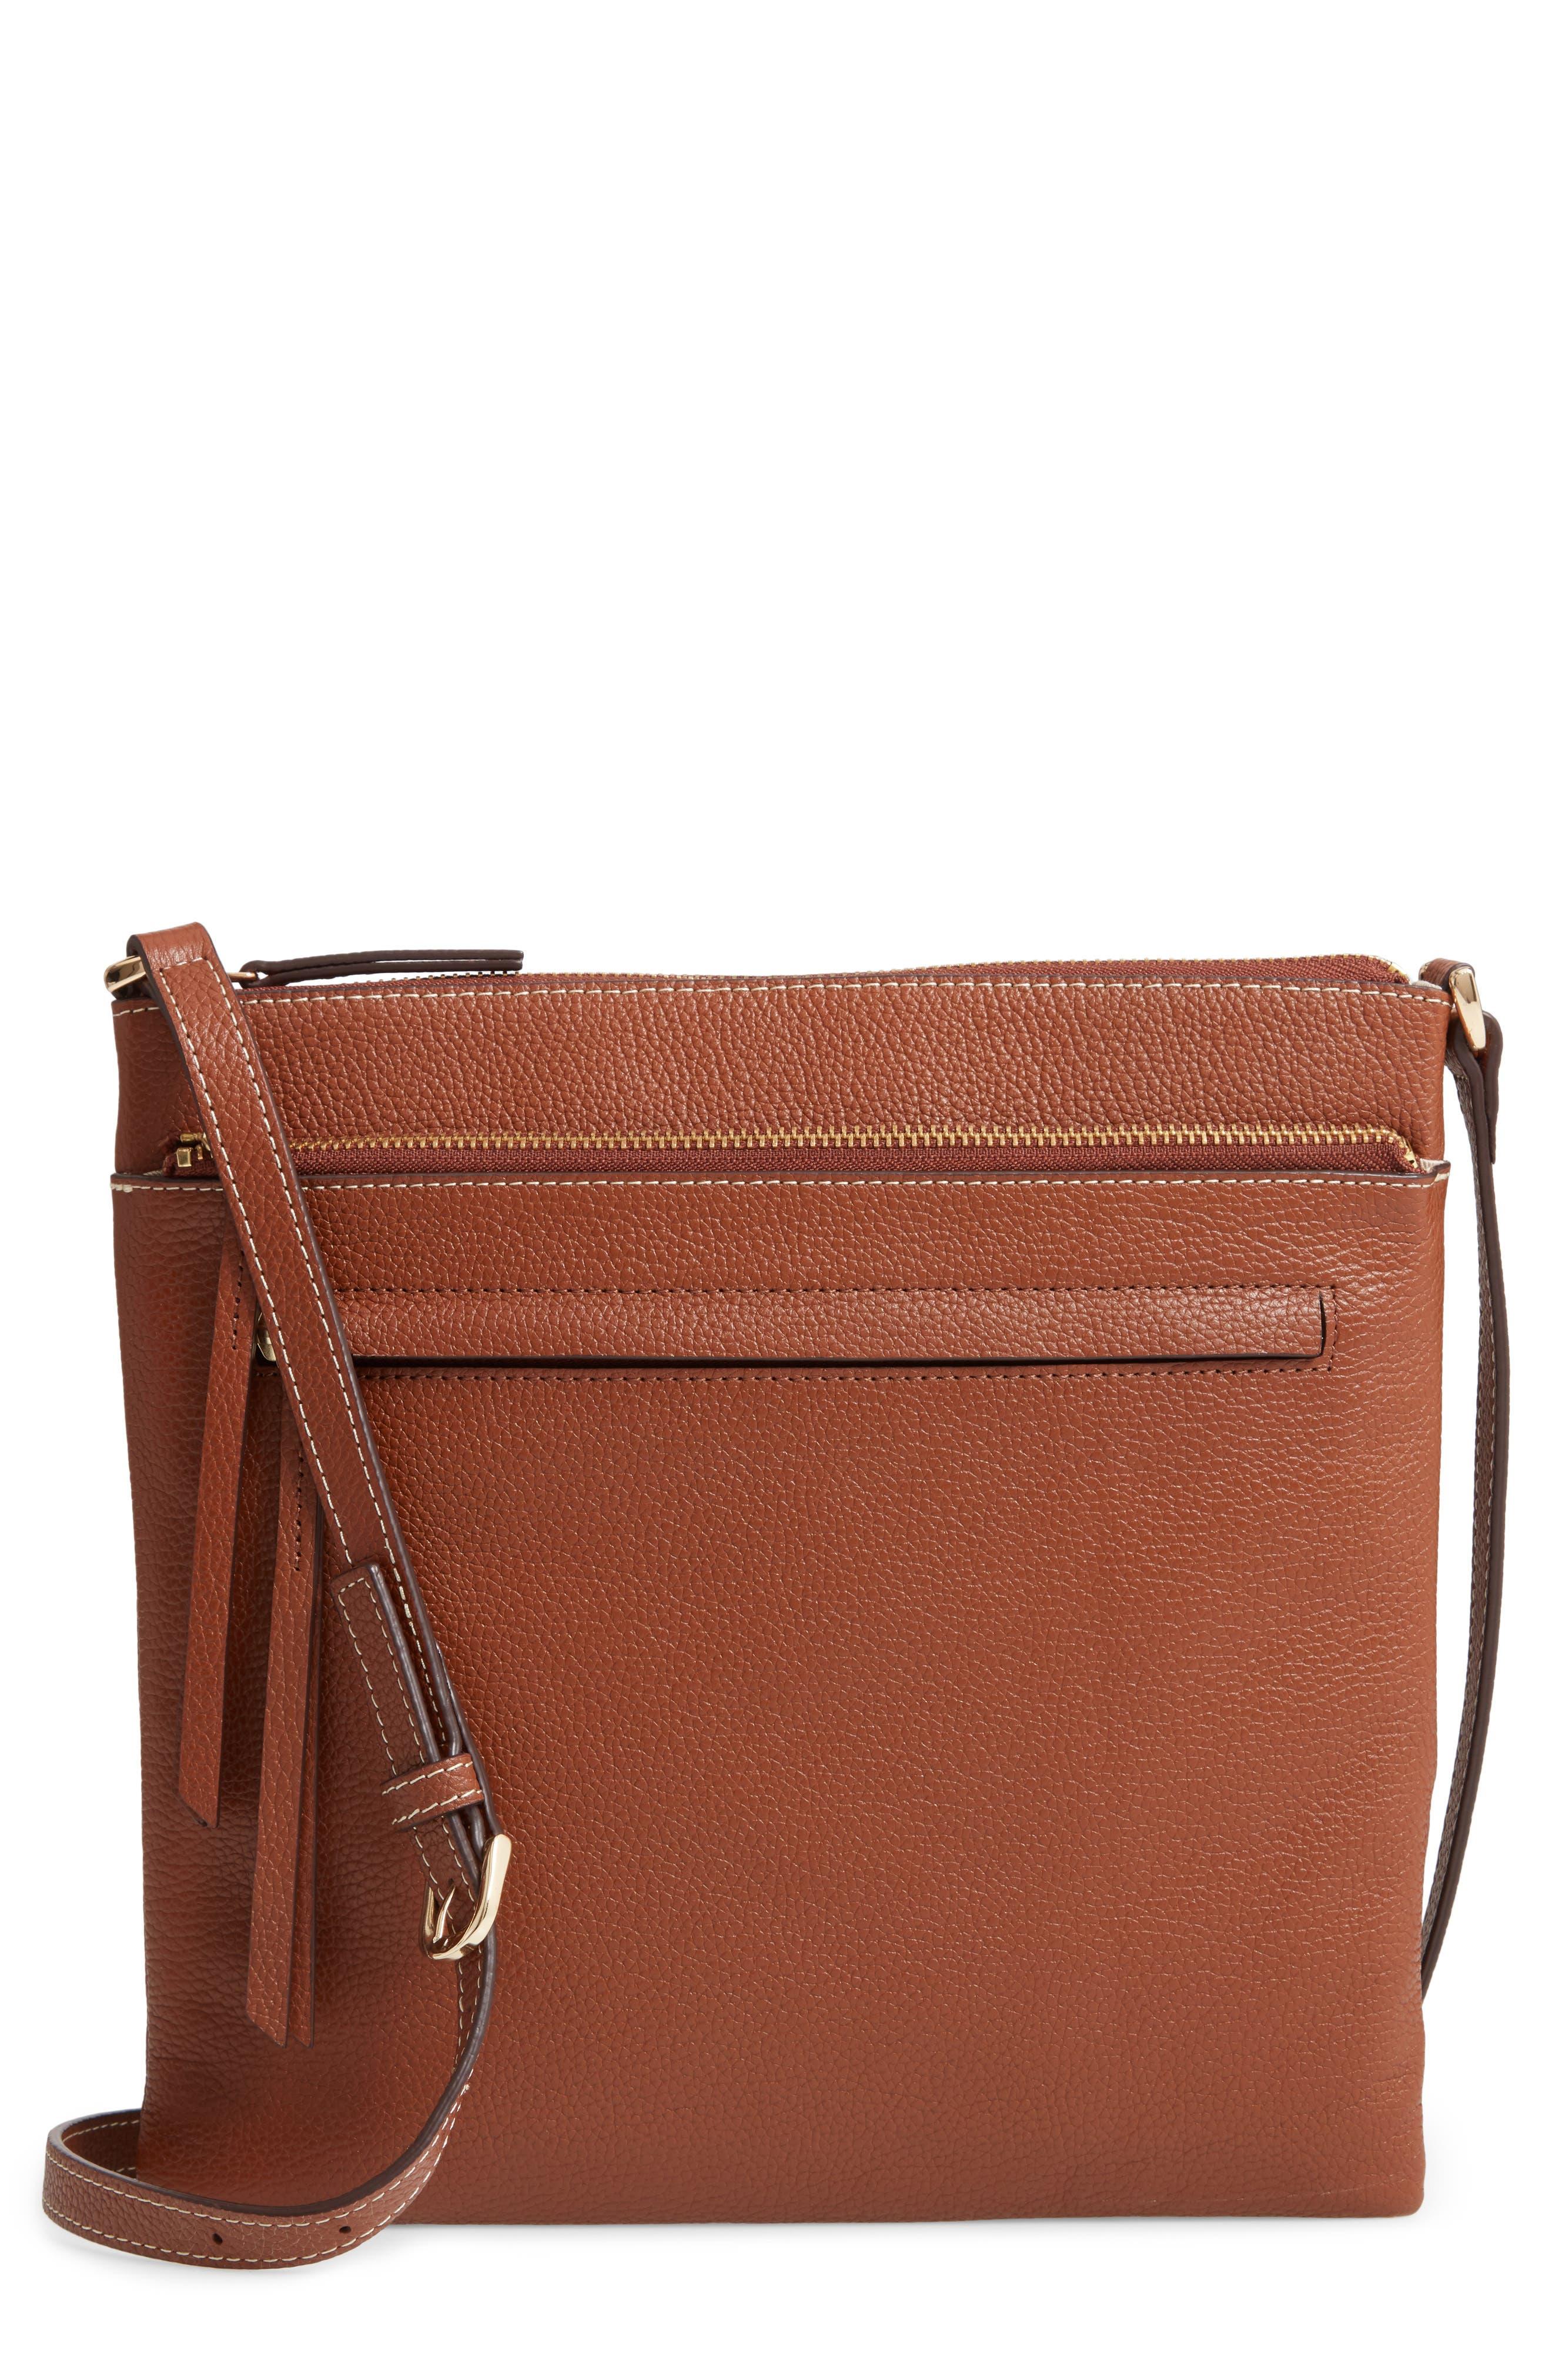 Finn Leather Crossbody Bag, Main, color, BROWN AZTEC